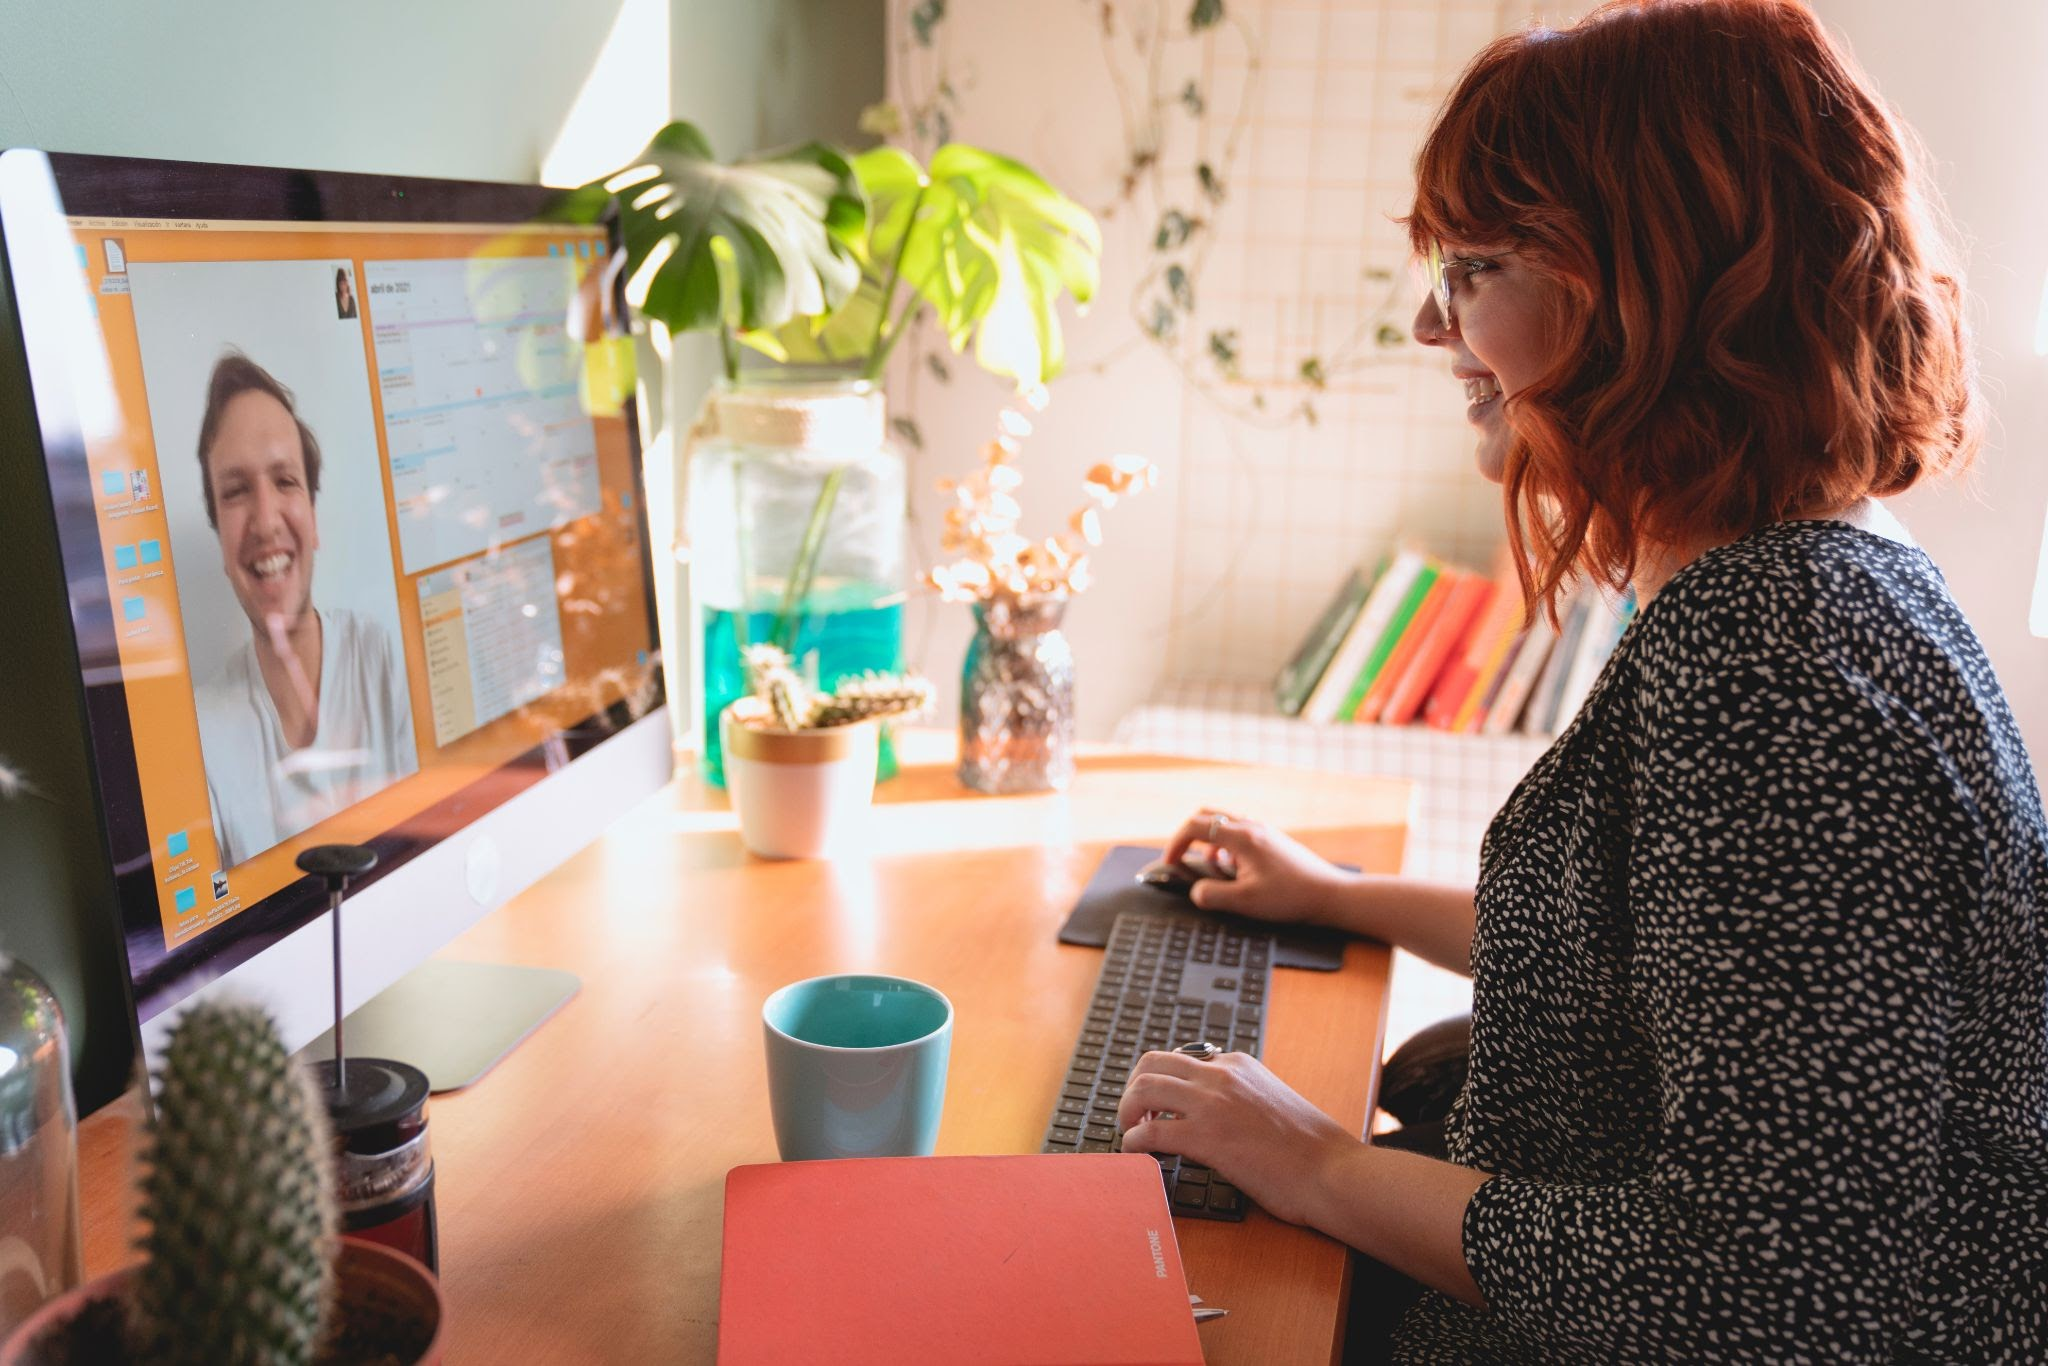 Organisations Switch to Remote Proctoring Examination